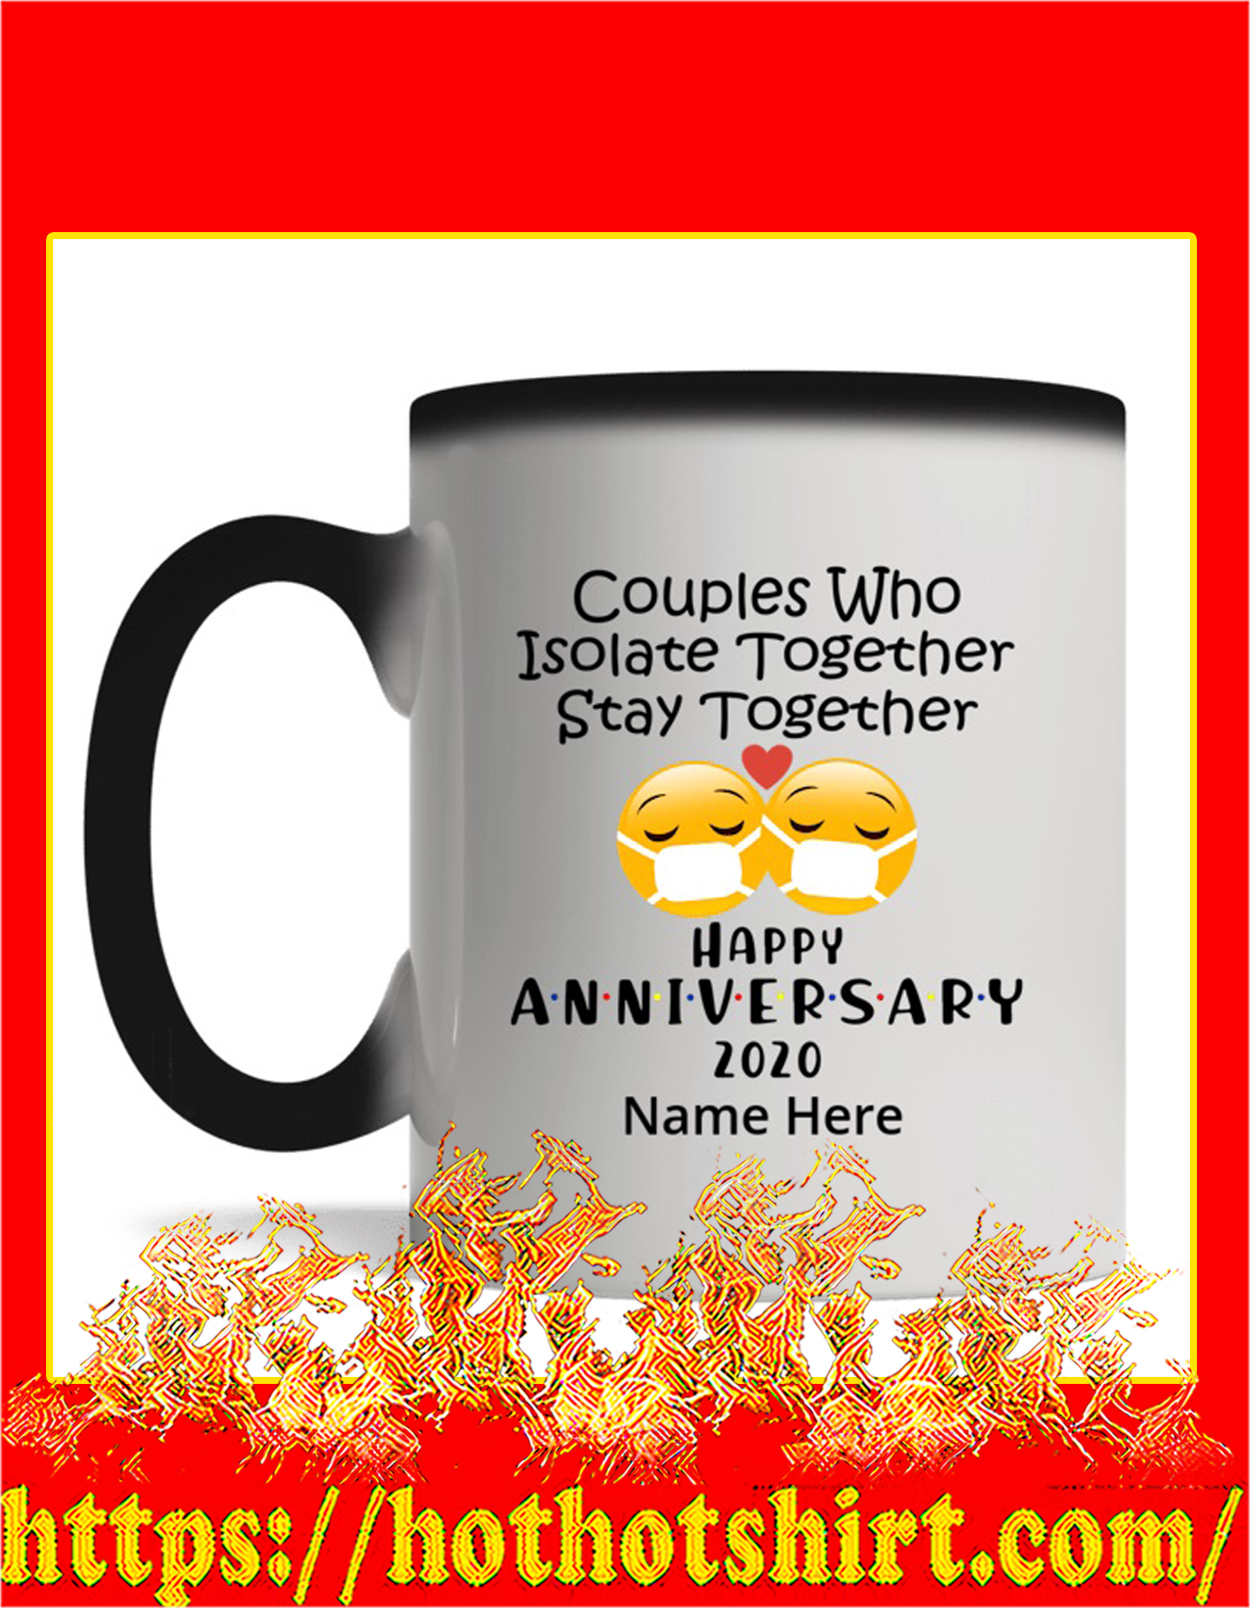 Couples who isolate together happy anniversary 2020 custom name mug - change color